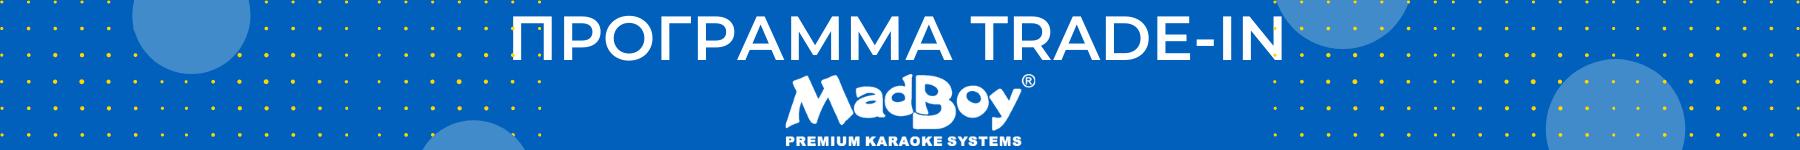 trade-in-madboy